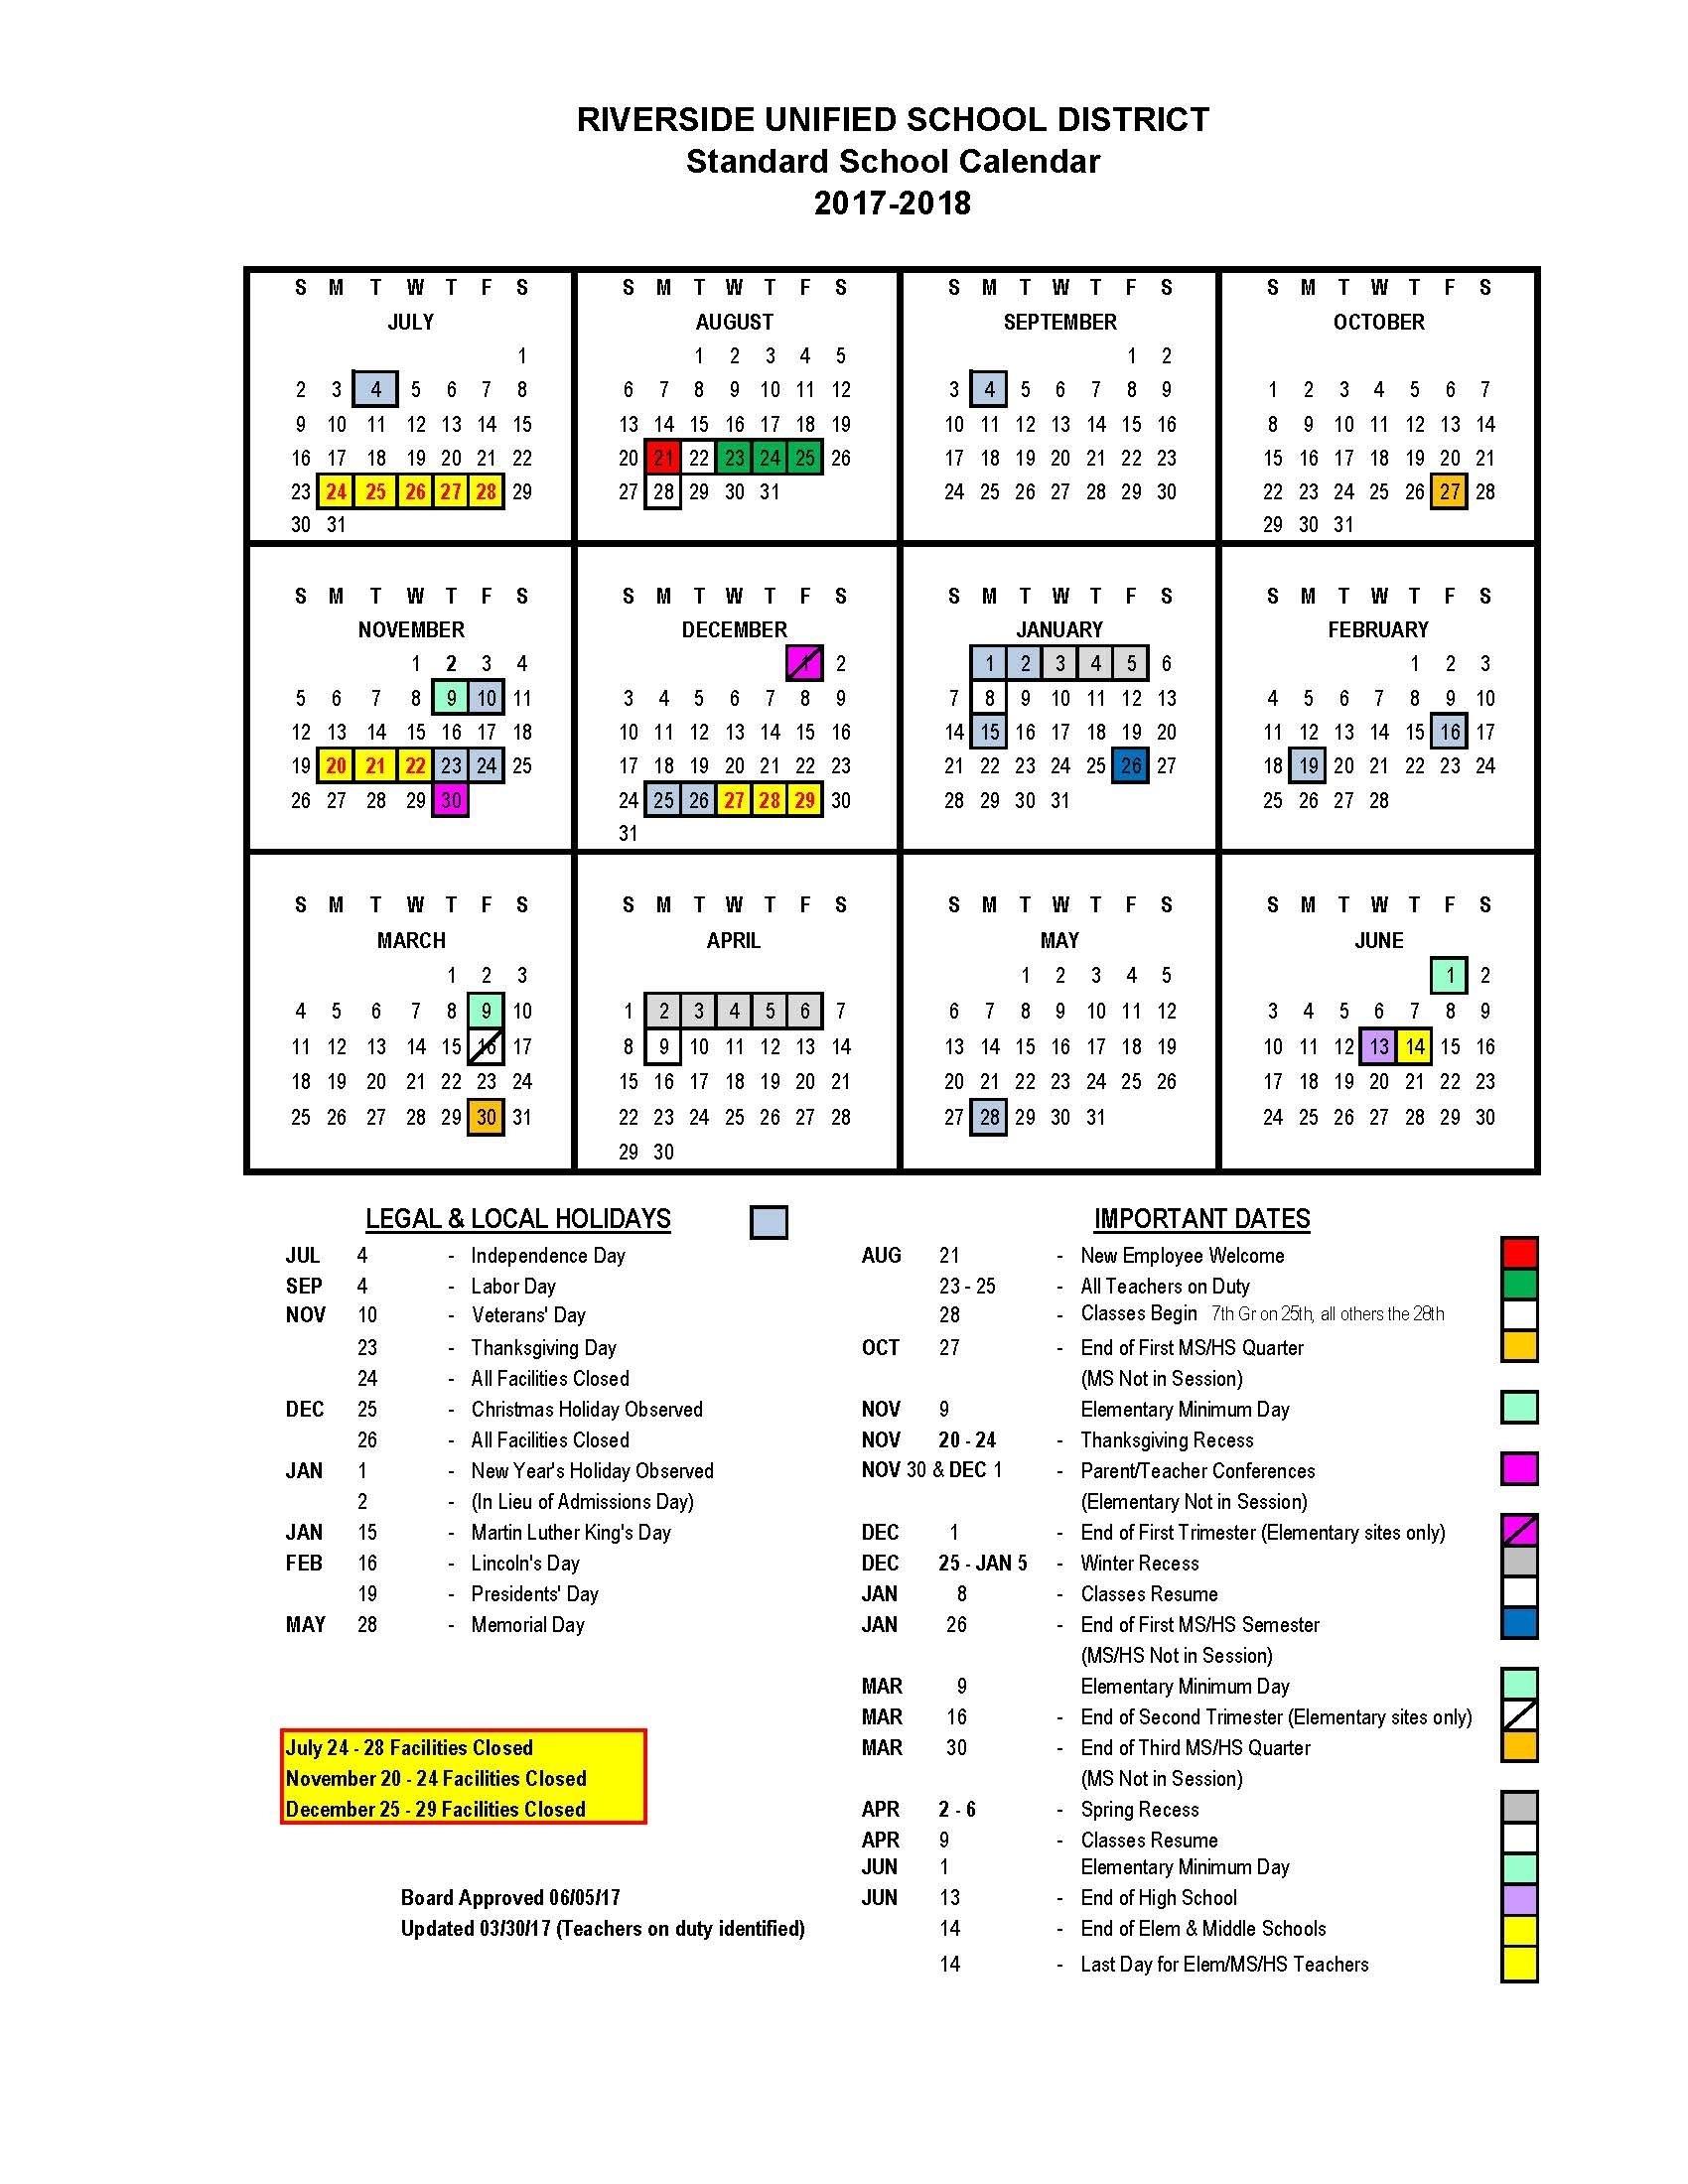 Berkeley Academic Calender 20192020  Calendar Inspiration regarding Nus Academic Calendar 2018/19